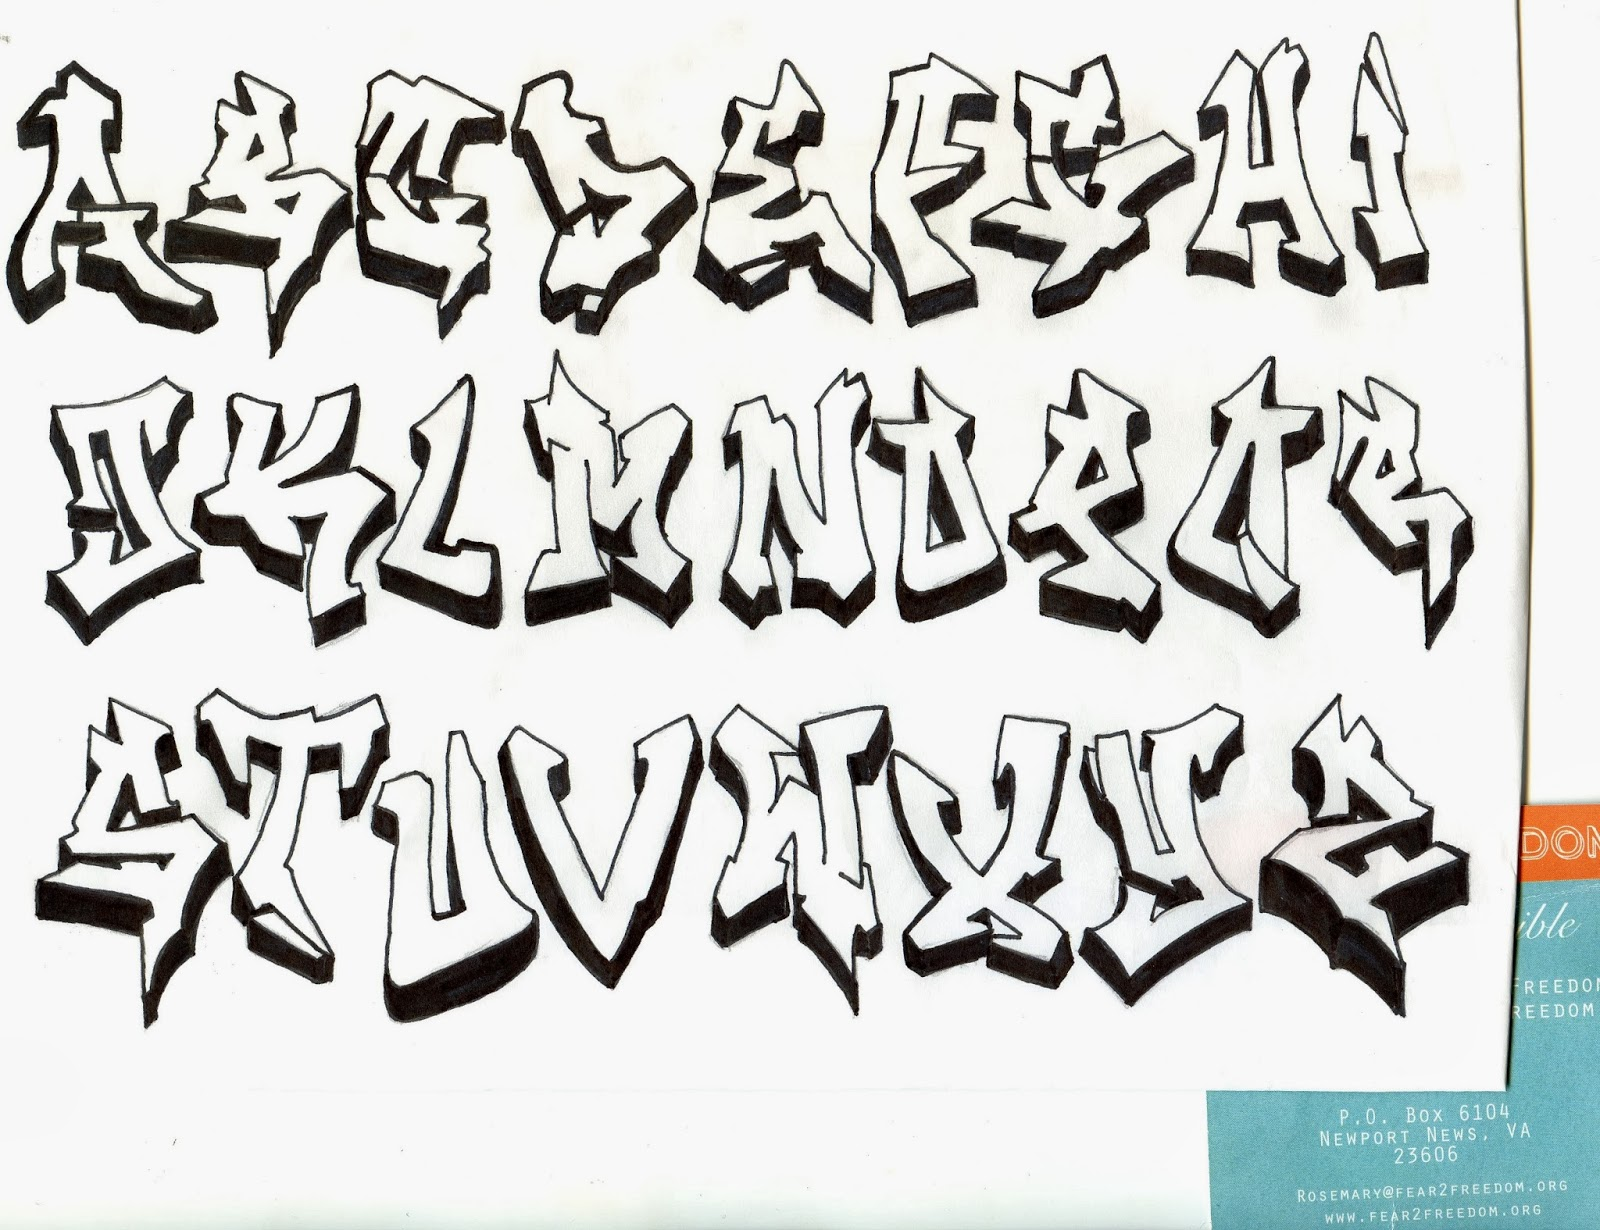 Graffiti Wall: Graffiti Alphabets